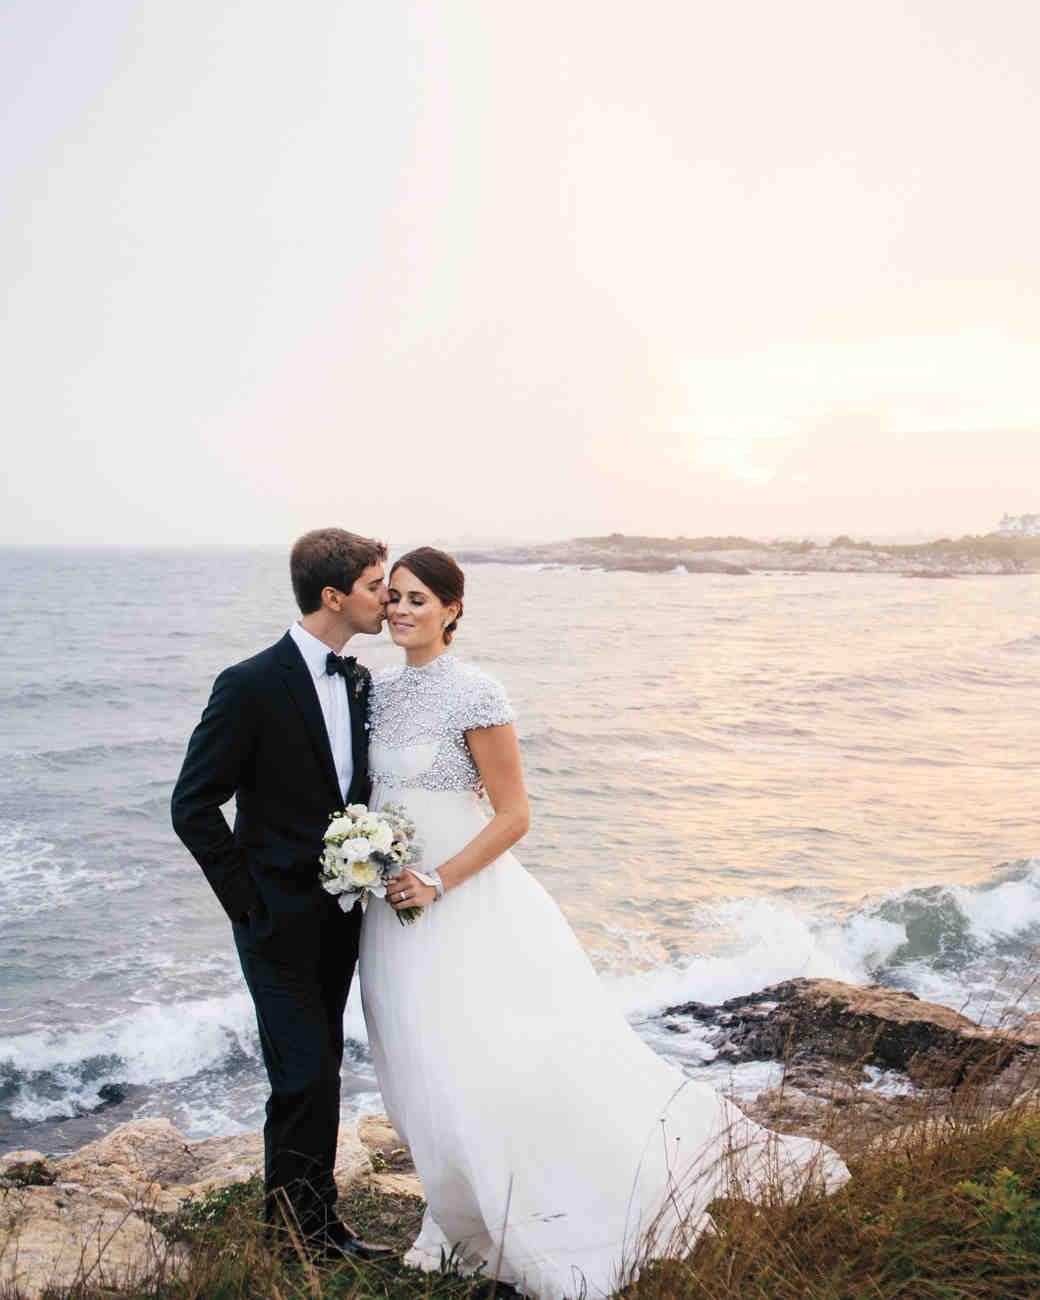 The best hairstyles for every wedding dress neckline newport rhode